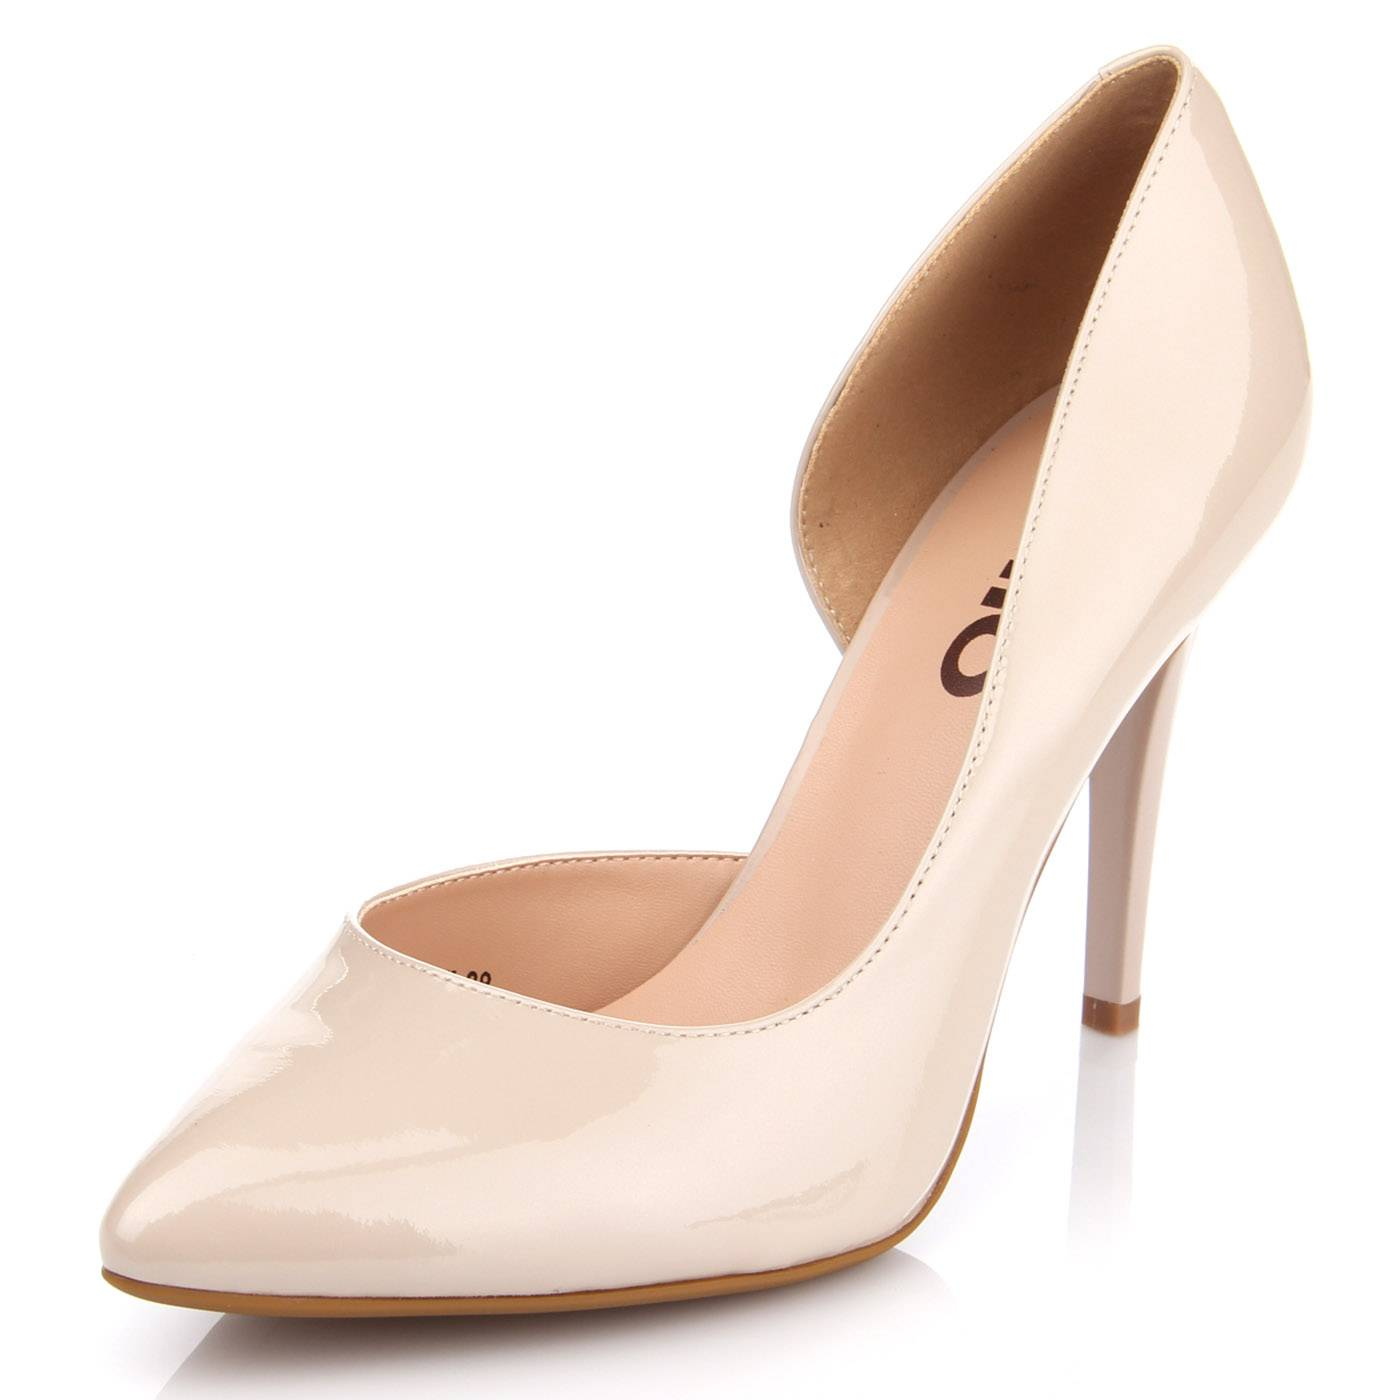 Туфлі жіночі ditto 5724 Бежевий купить по выгодной цене в интернет ... 65e70f6f14a3c